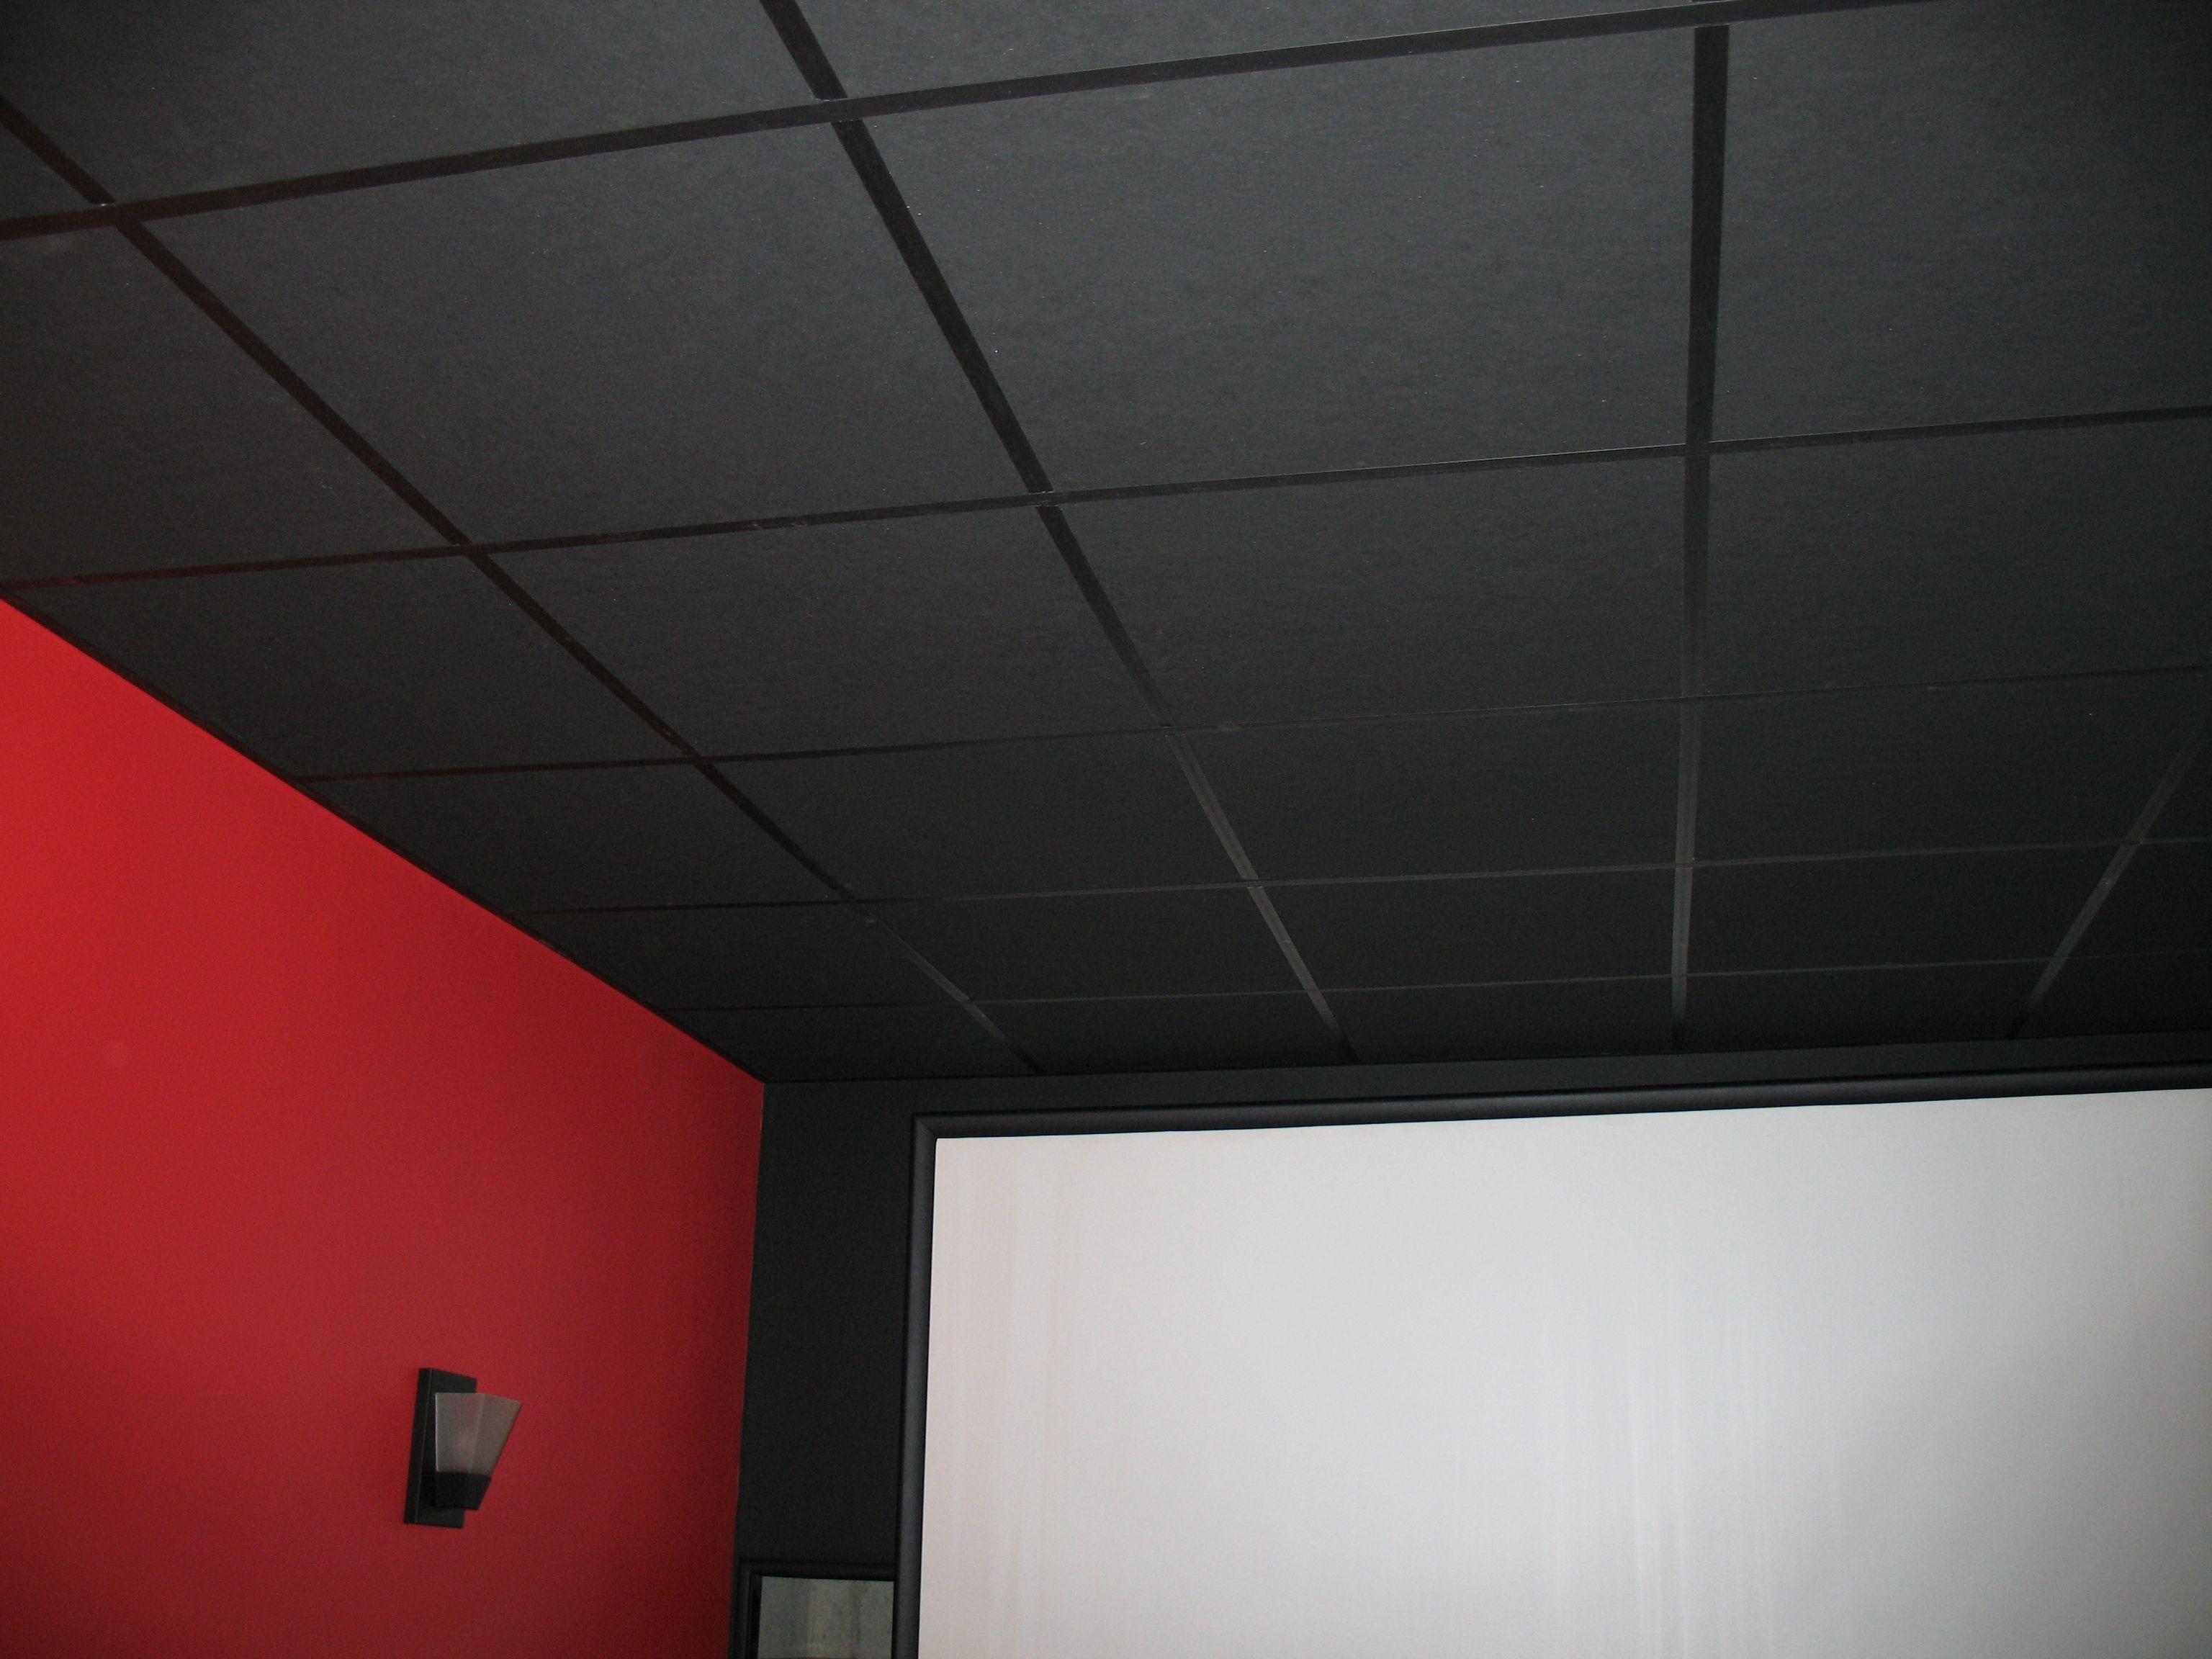 Acoustic Ceiling Tiles Home Depot